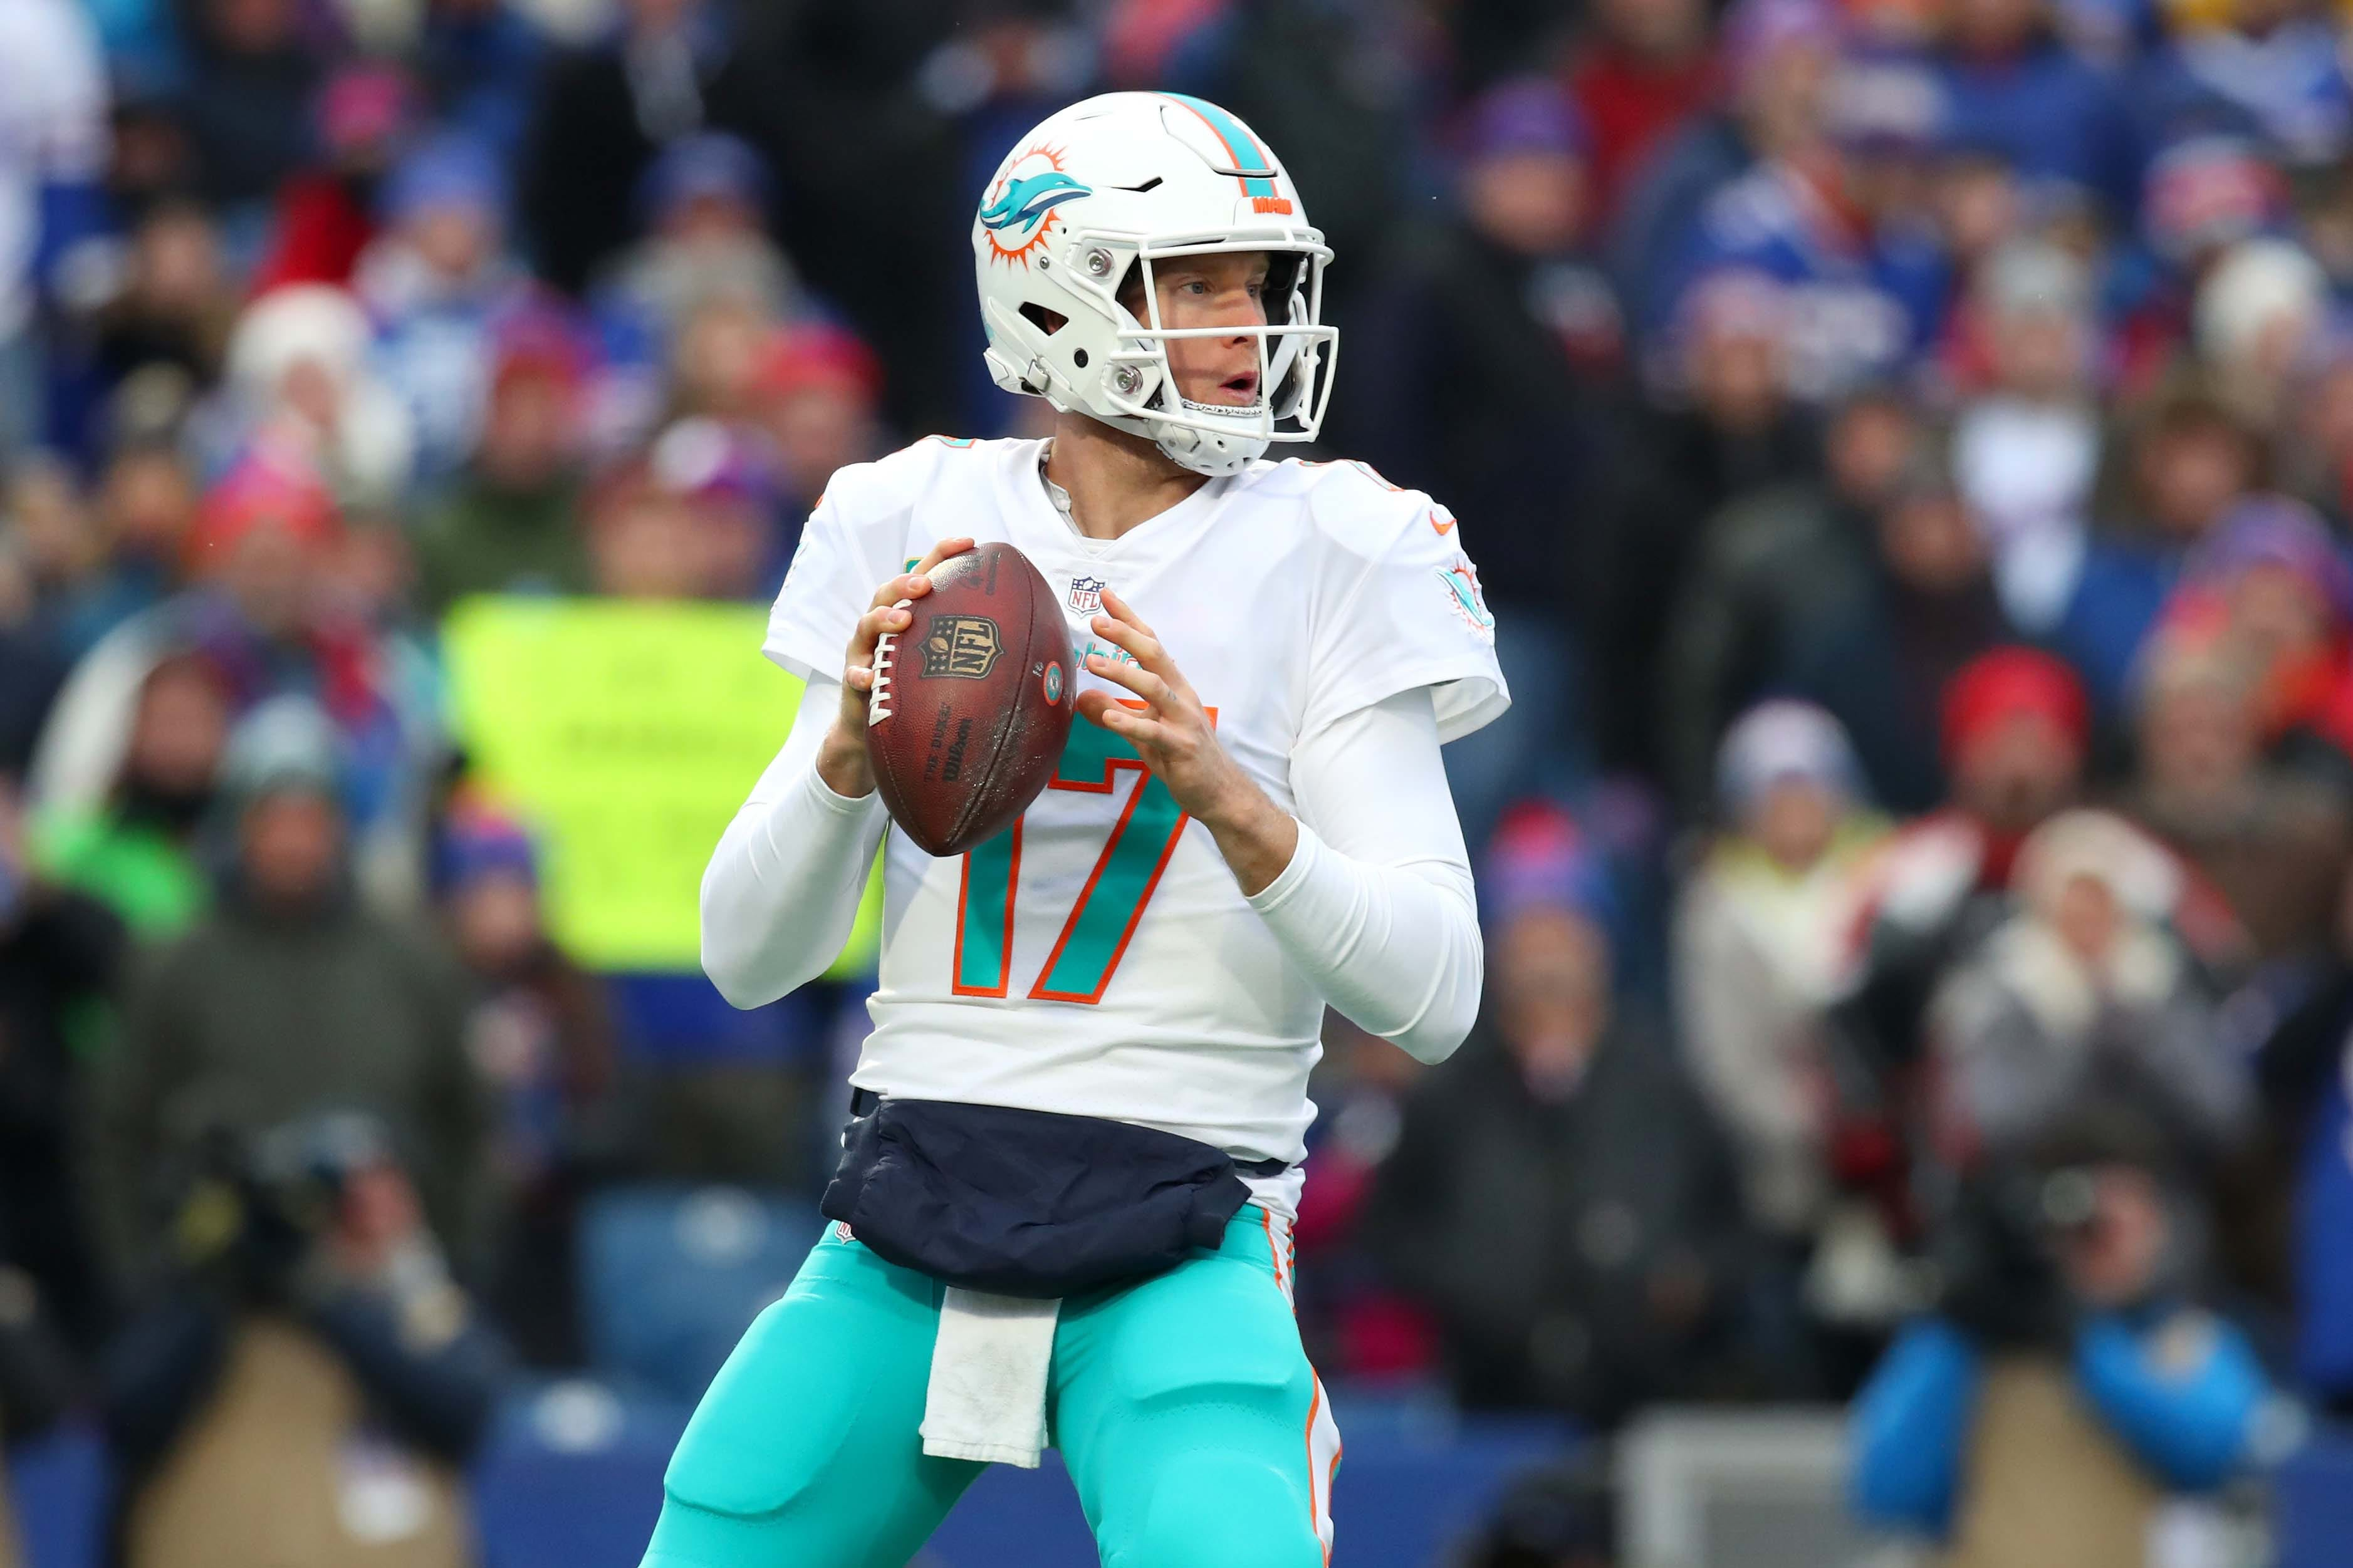 Dolphins trade starting QB Ryan Tannehill to Titans